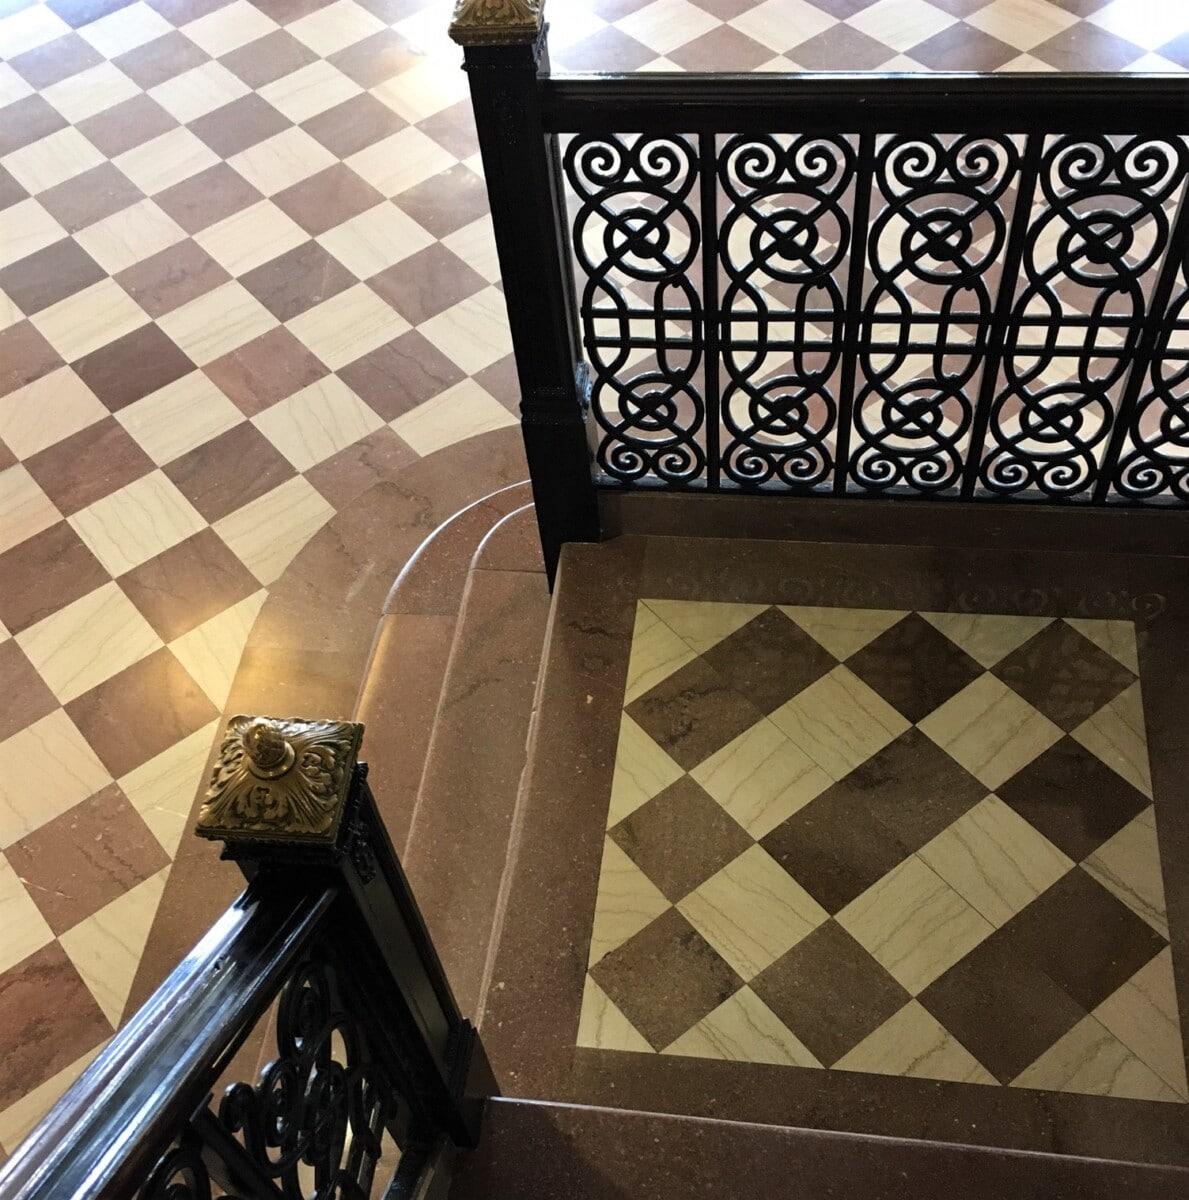 architectural detail on stairway